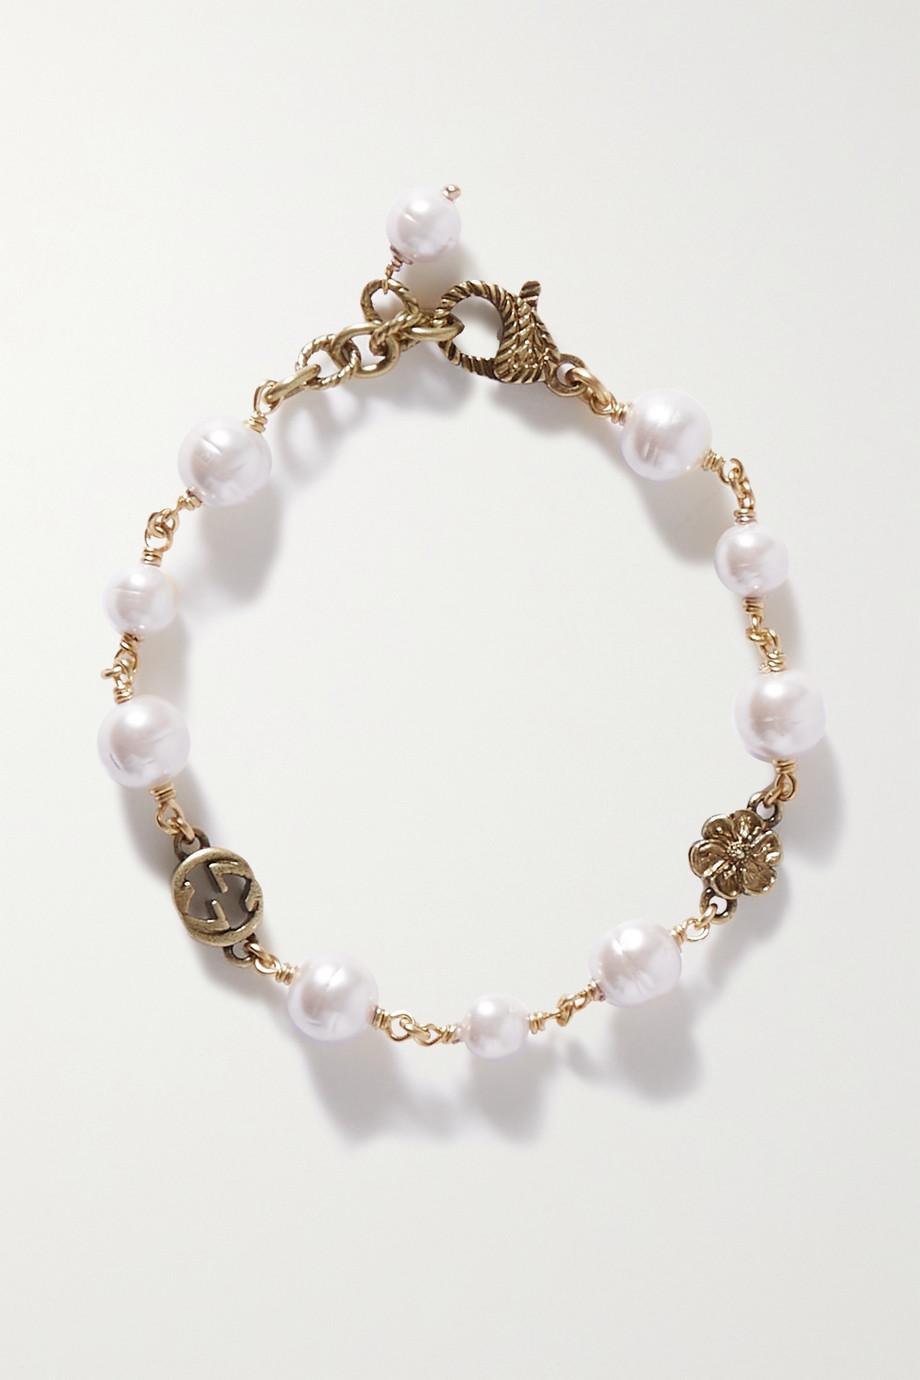 Gucci Goldfarbenes Armband mit Kunstperlen